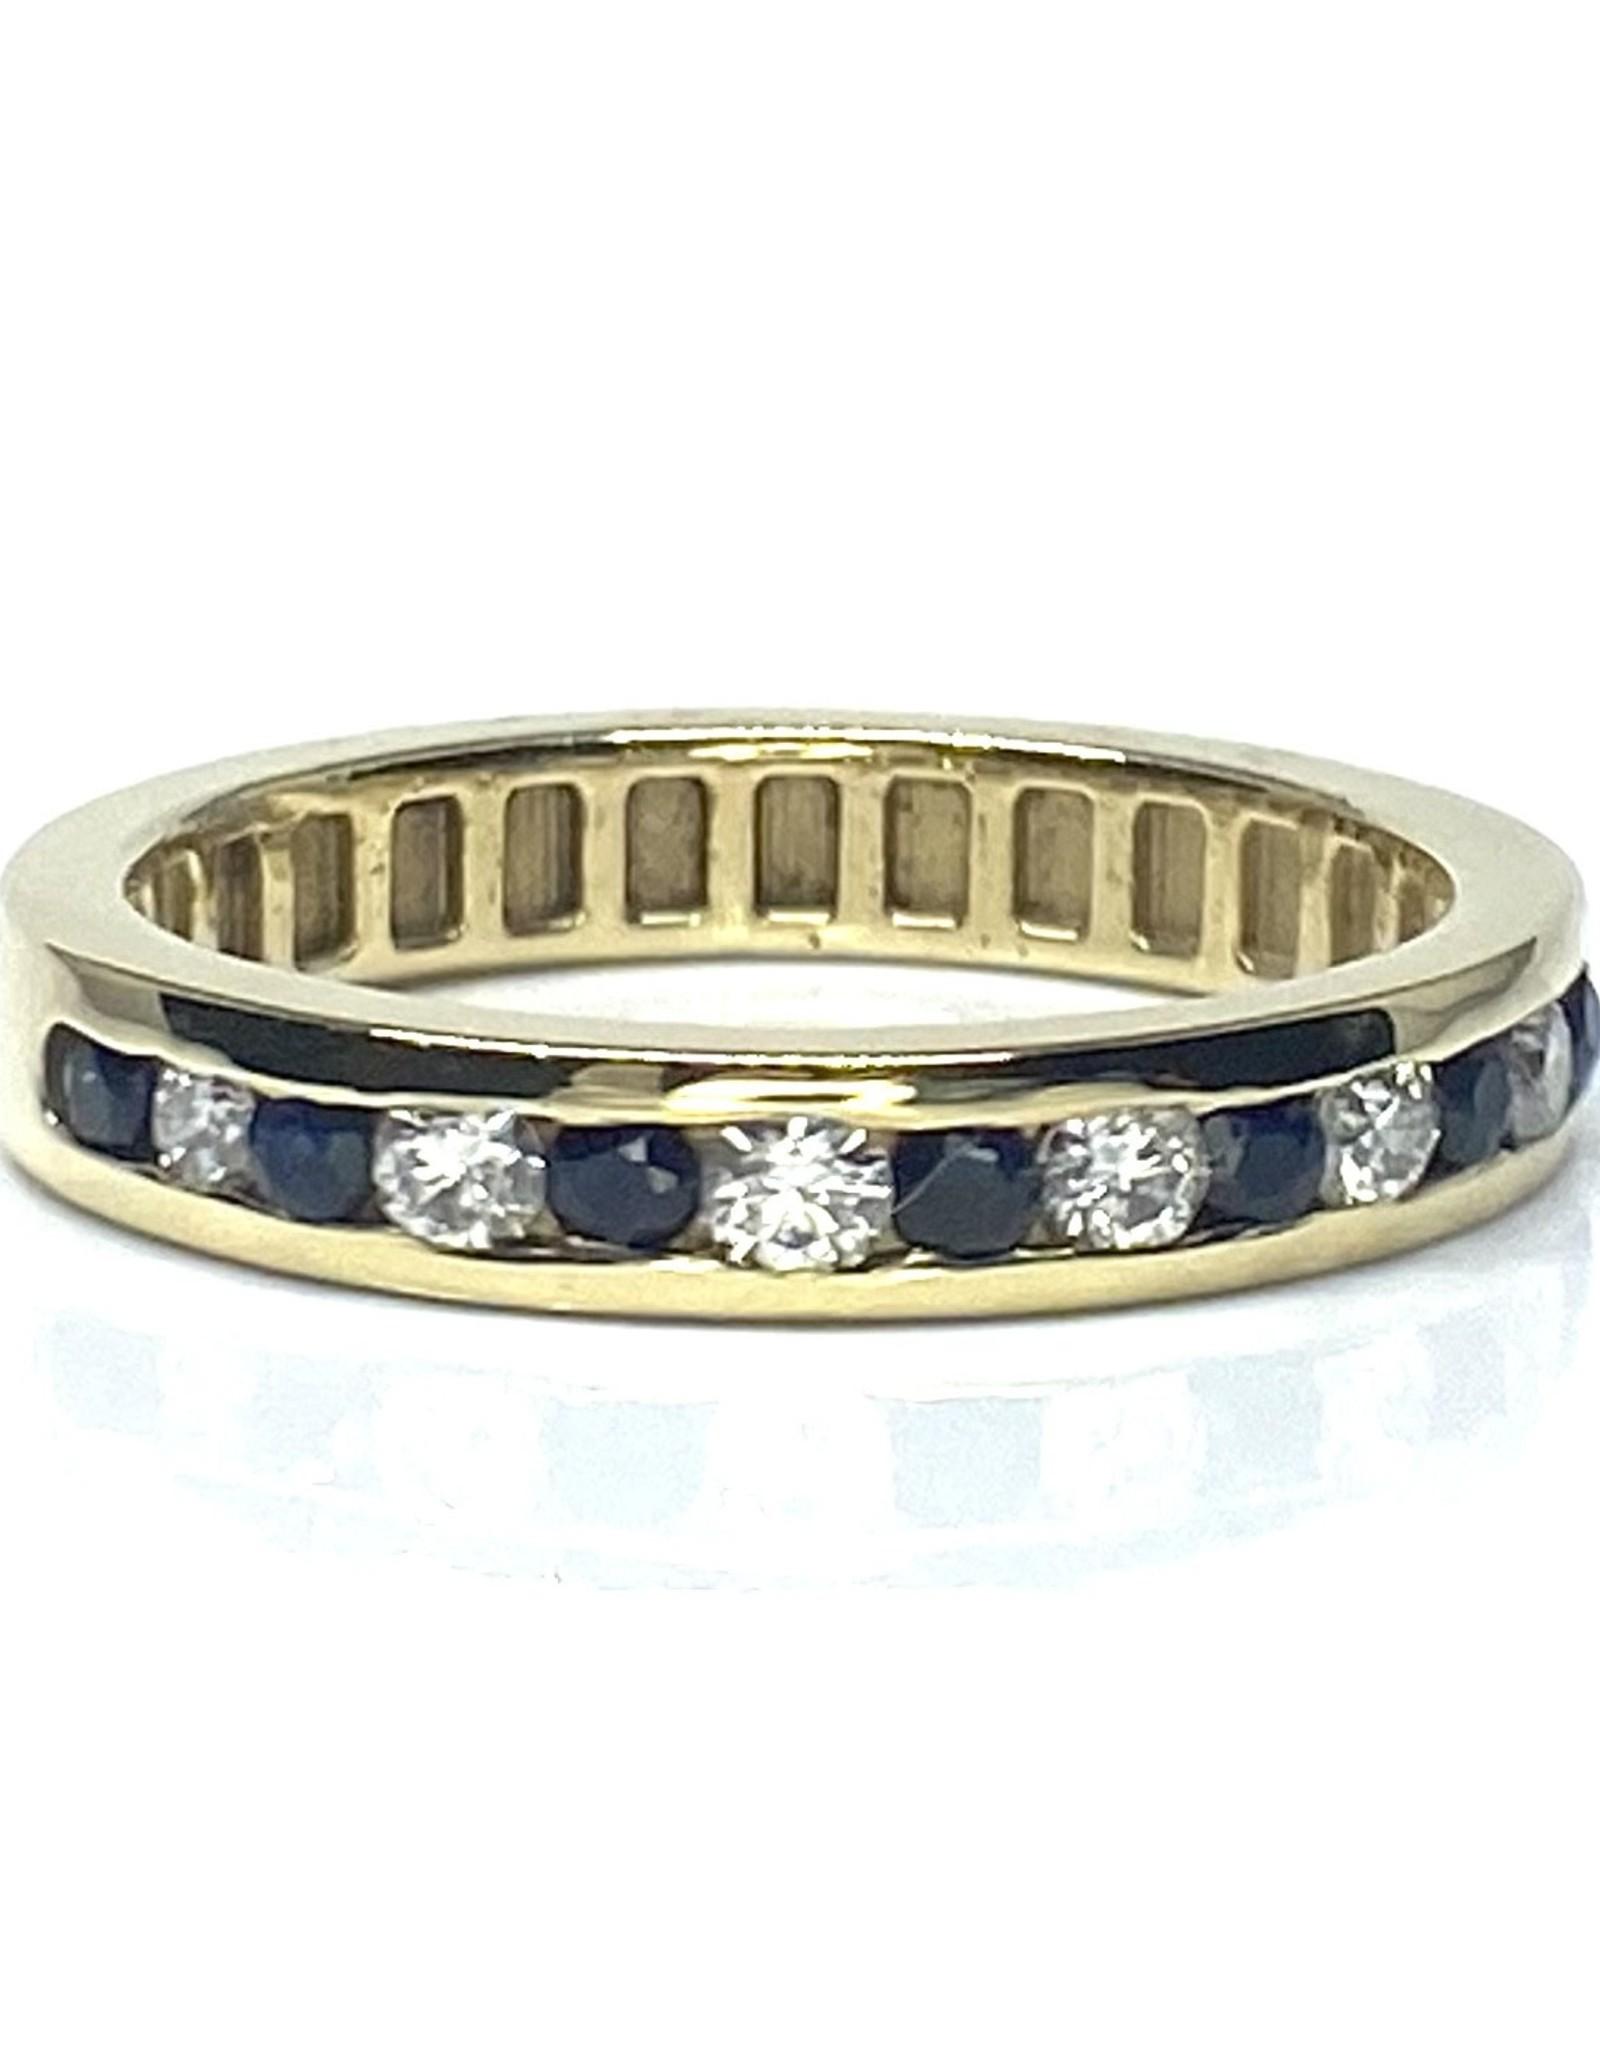 Nobles Metales 14K 7 Sapphire 6 Diamond Ring